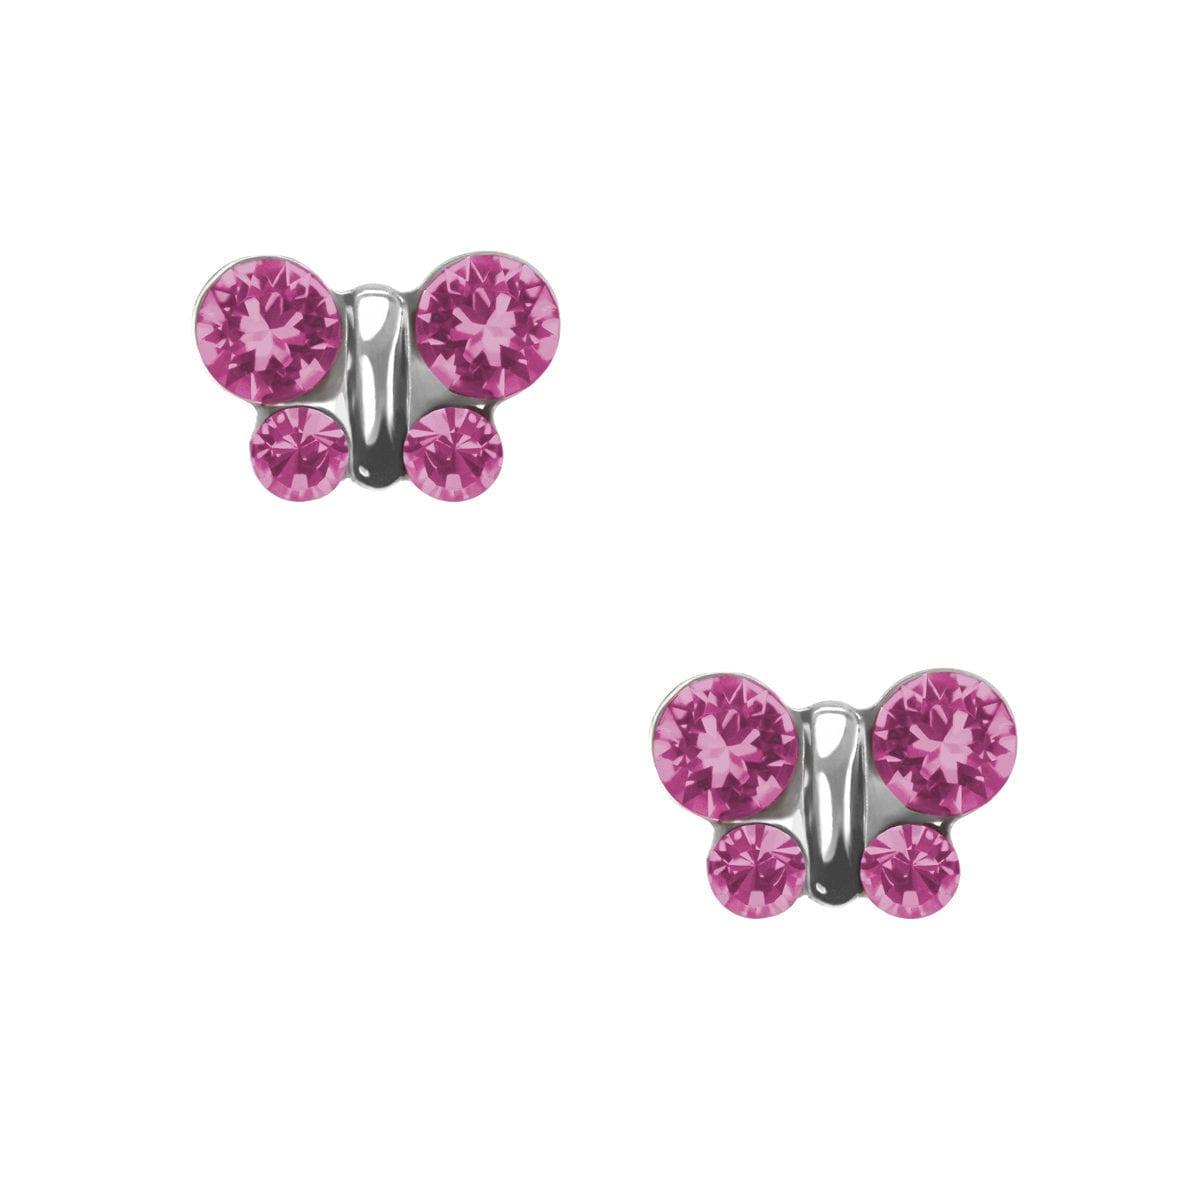 studex-sensitive-butterfly-october-rose-stud-earrings